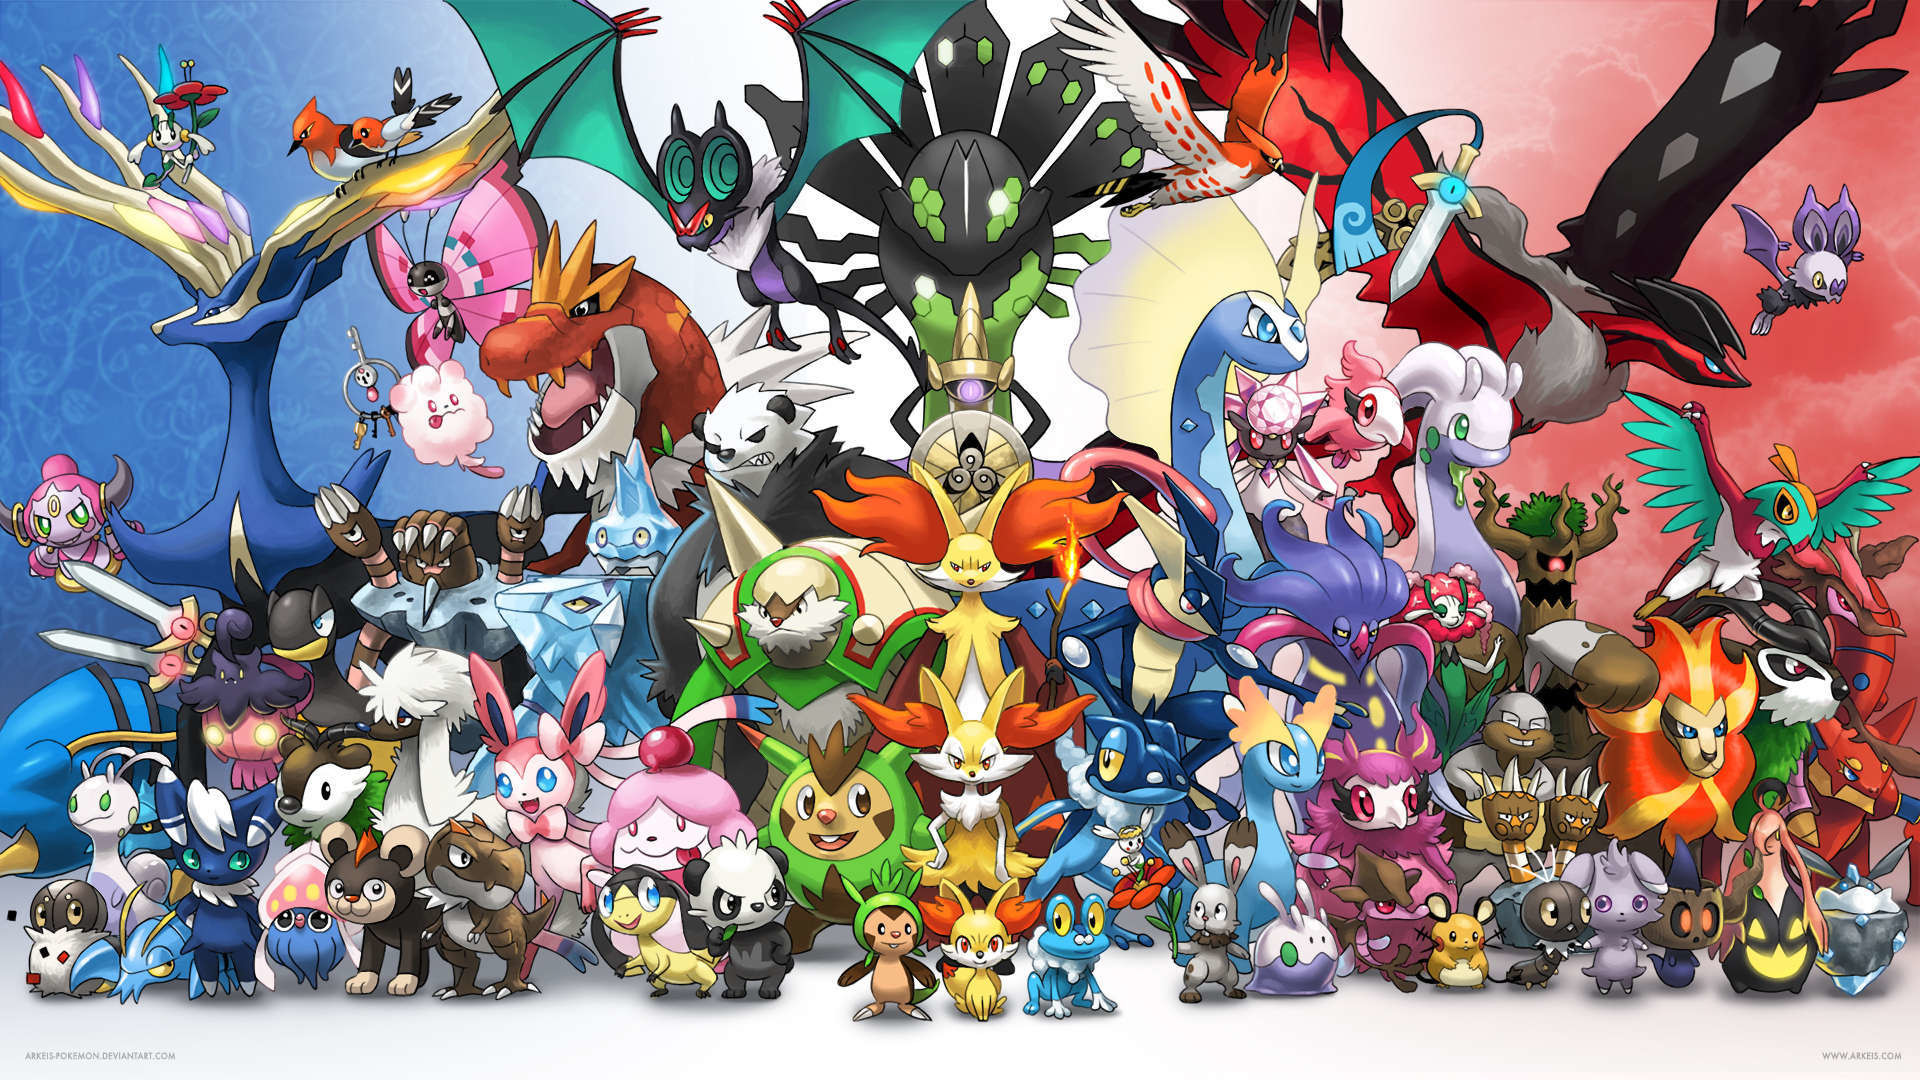 Imagenes Hd 1080p: Pokemon HD Wallpapers 1080p (72+ Images